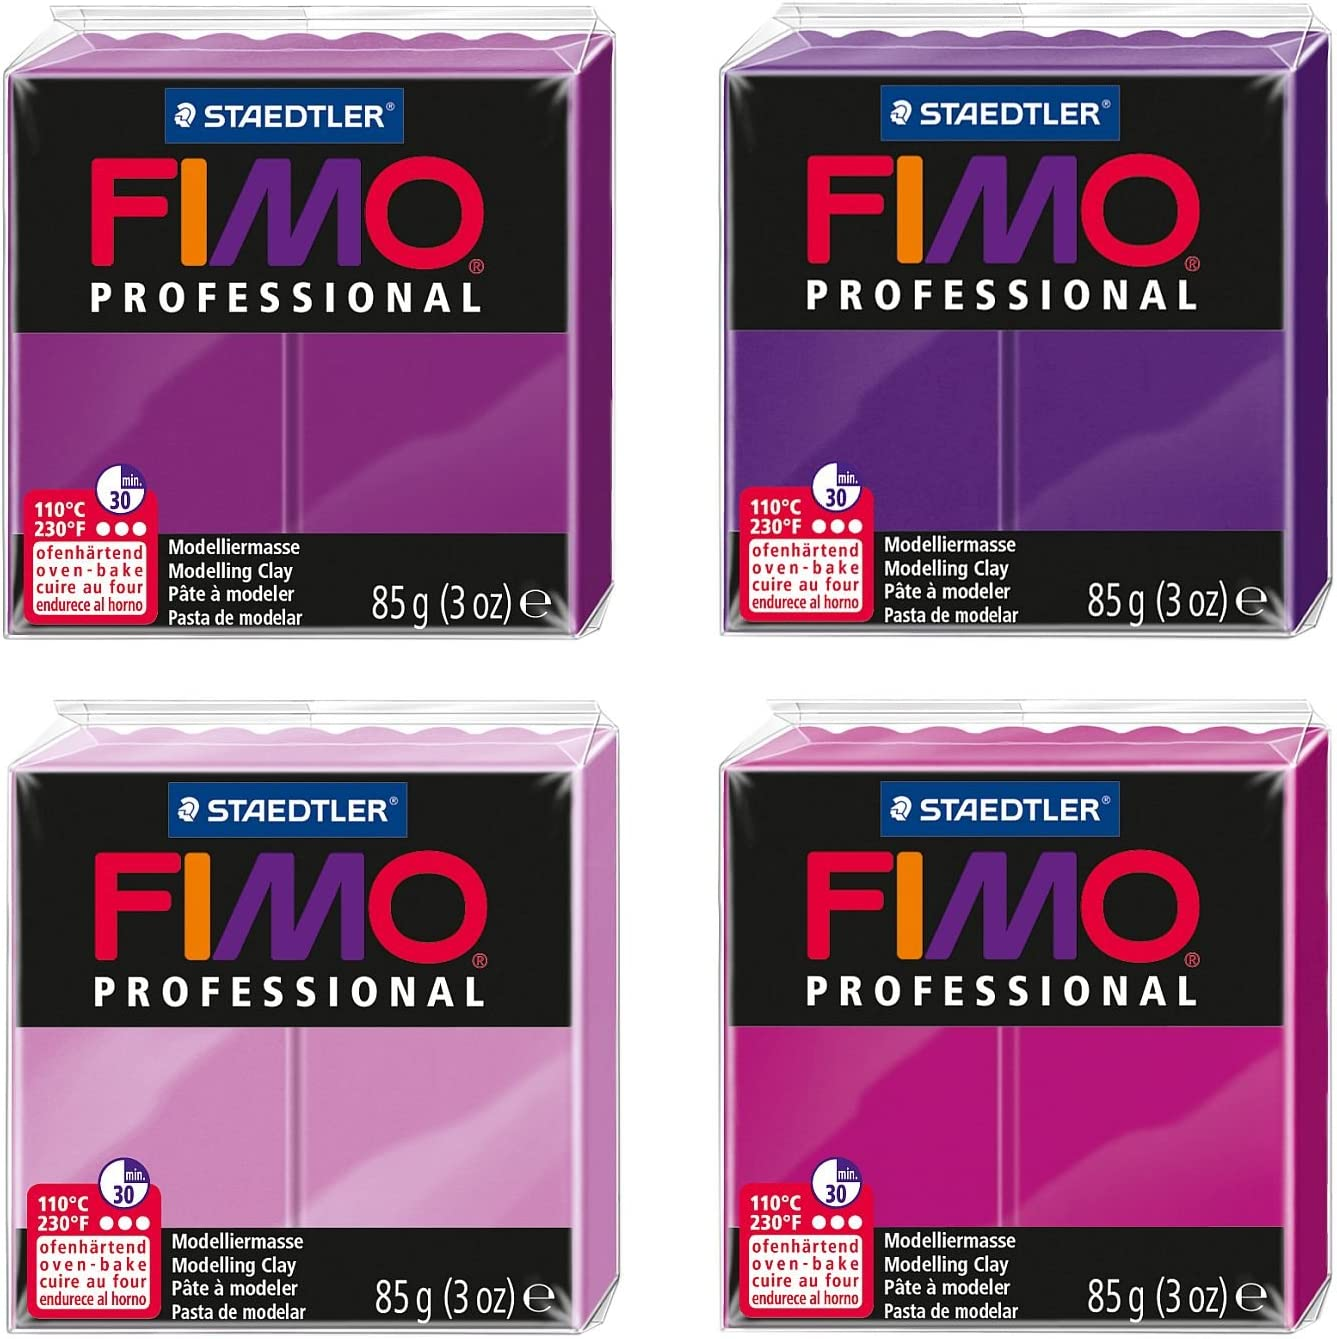 Fimo professional Modelliermasse blaut/öne 4 Bl/öcke 85 g Staedtler 8004 AMZ 05